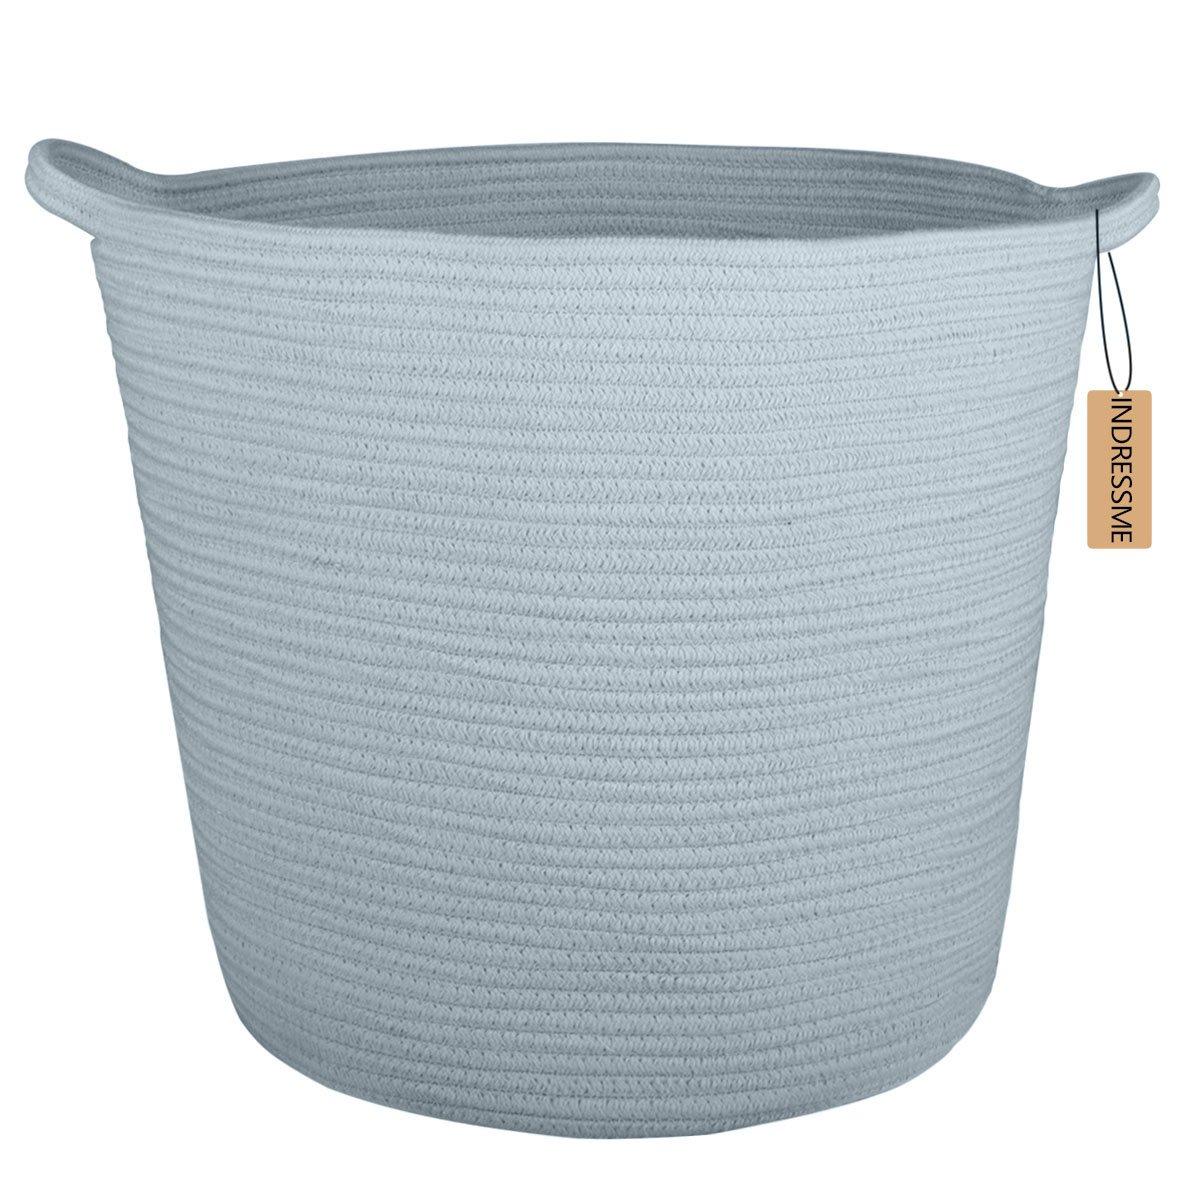 "INDRESSME 16.0""x 15.0""x12.6"" XL Baby Laundry Woven Storage Baskets Cotton Rope Basket Basket Blanket Basket with Handle Toy Bakset Home Decor Addition, Blue Grey"